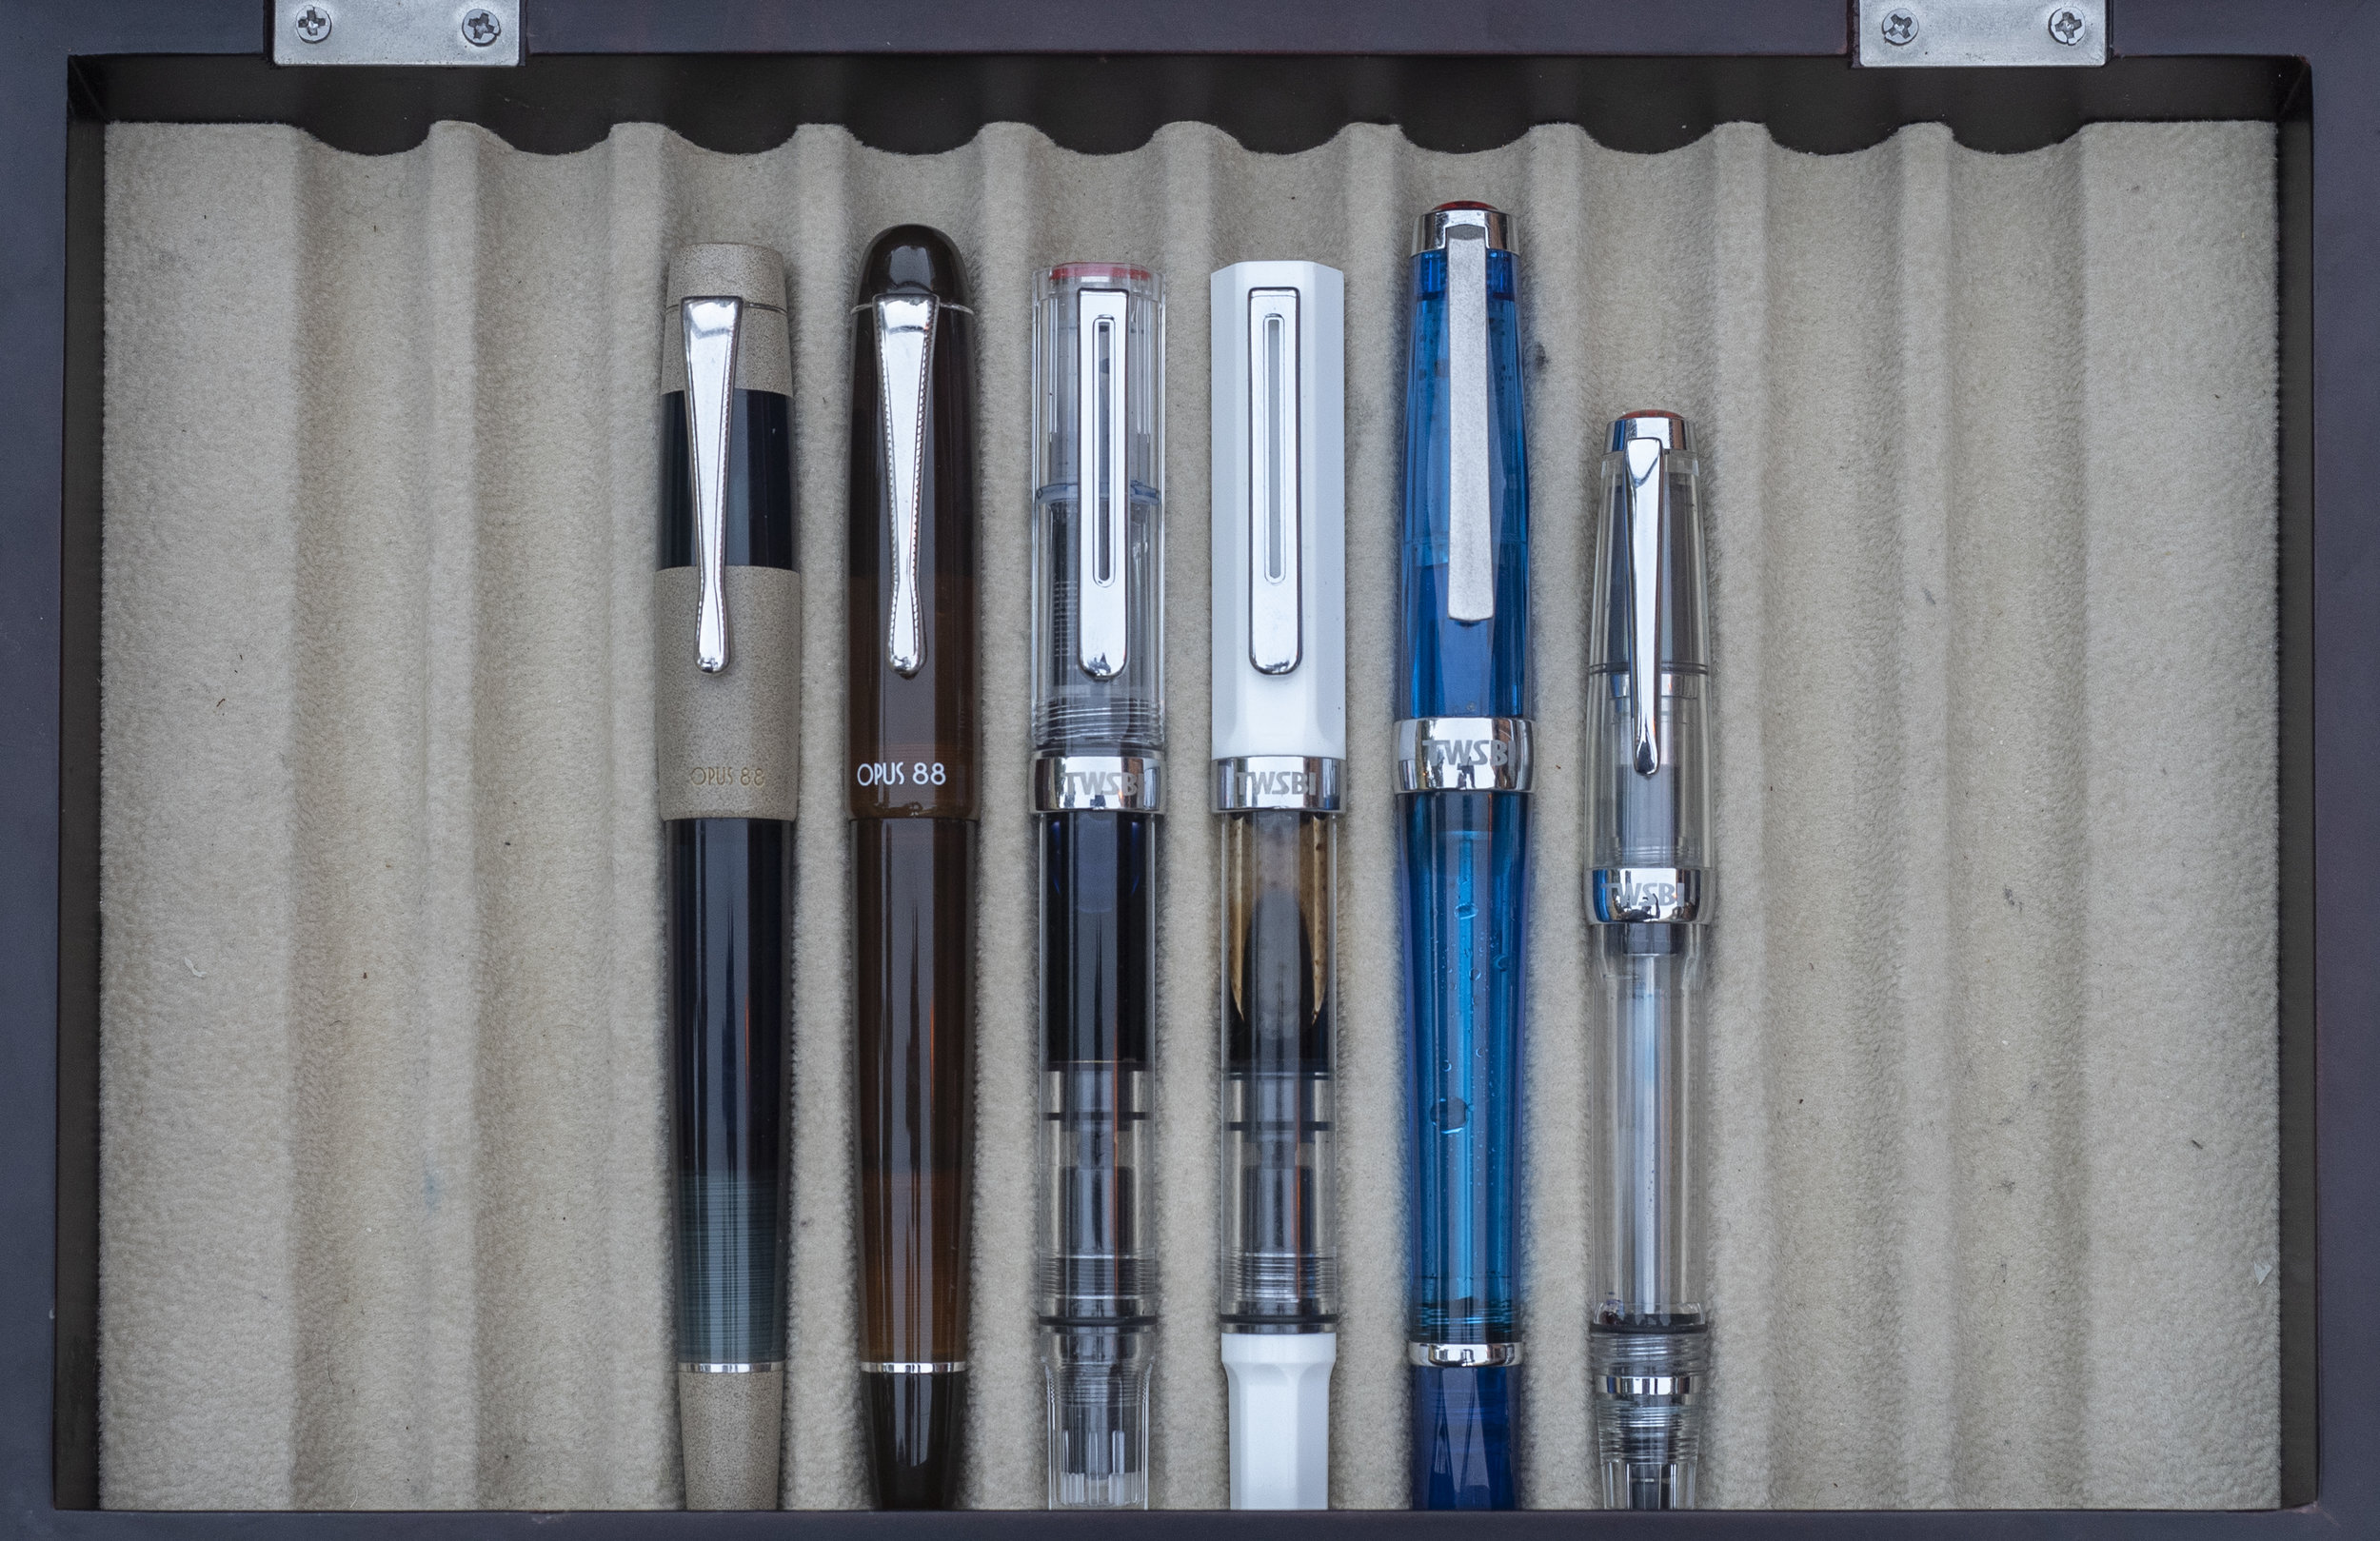 Taiwanese Pens